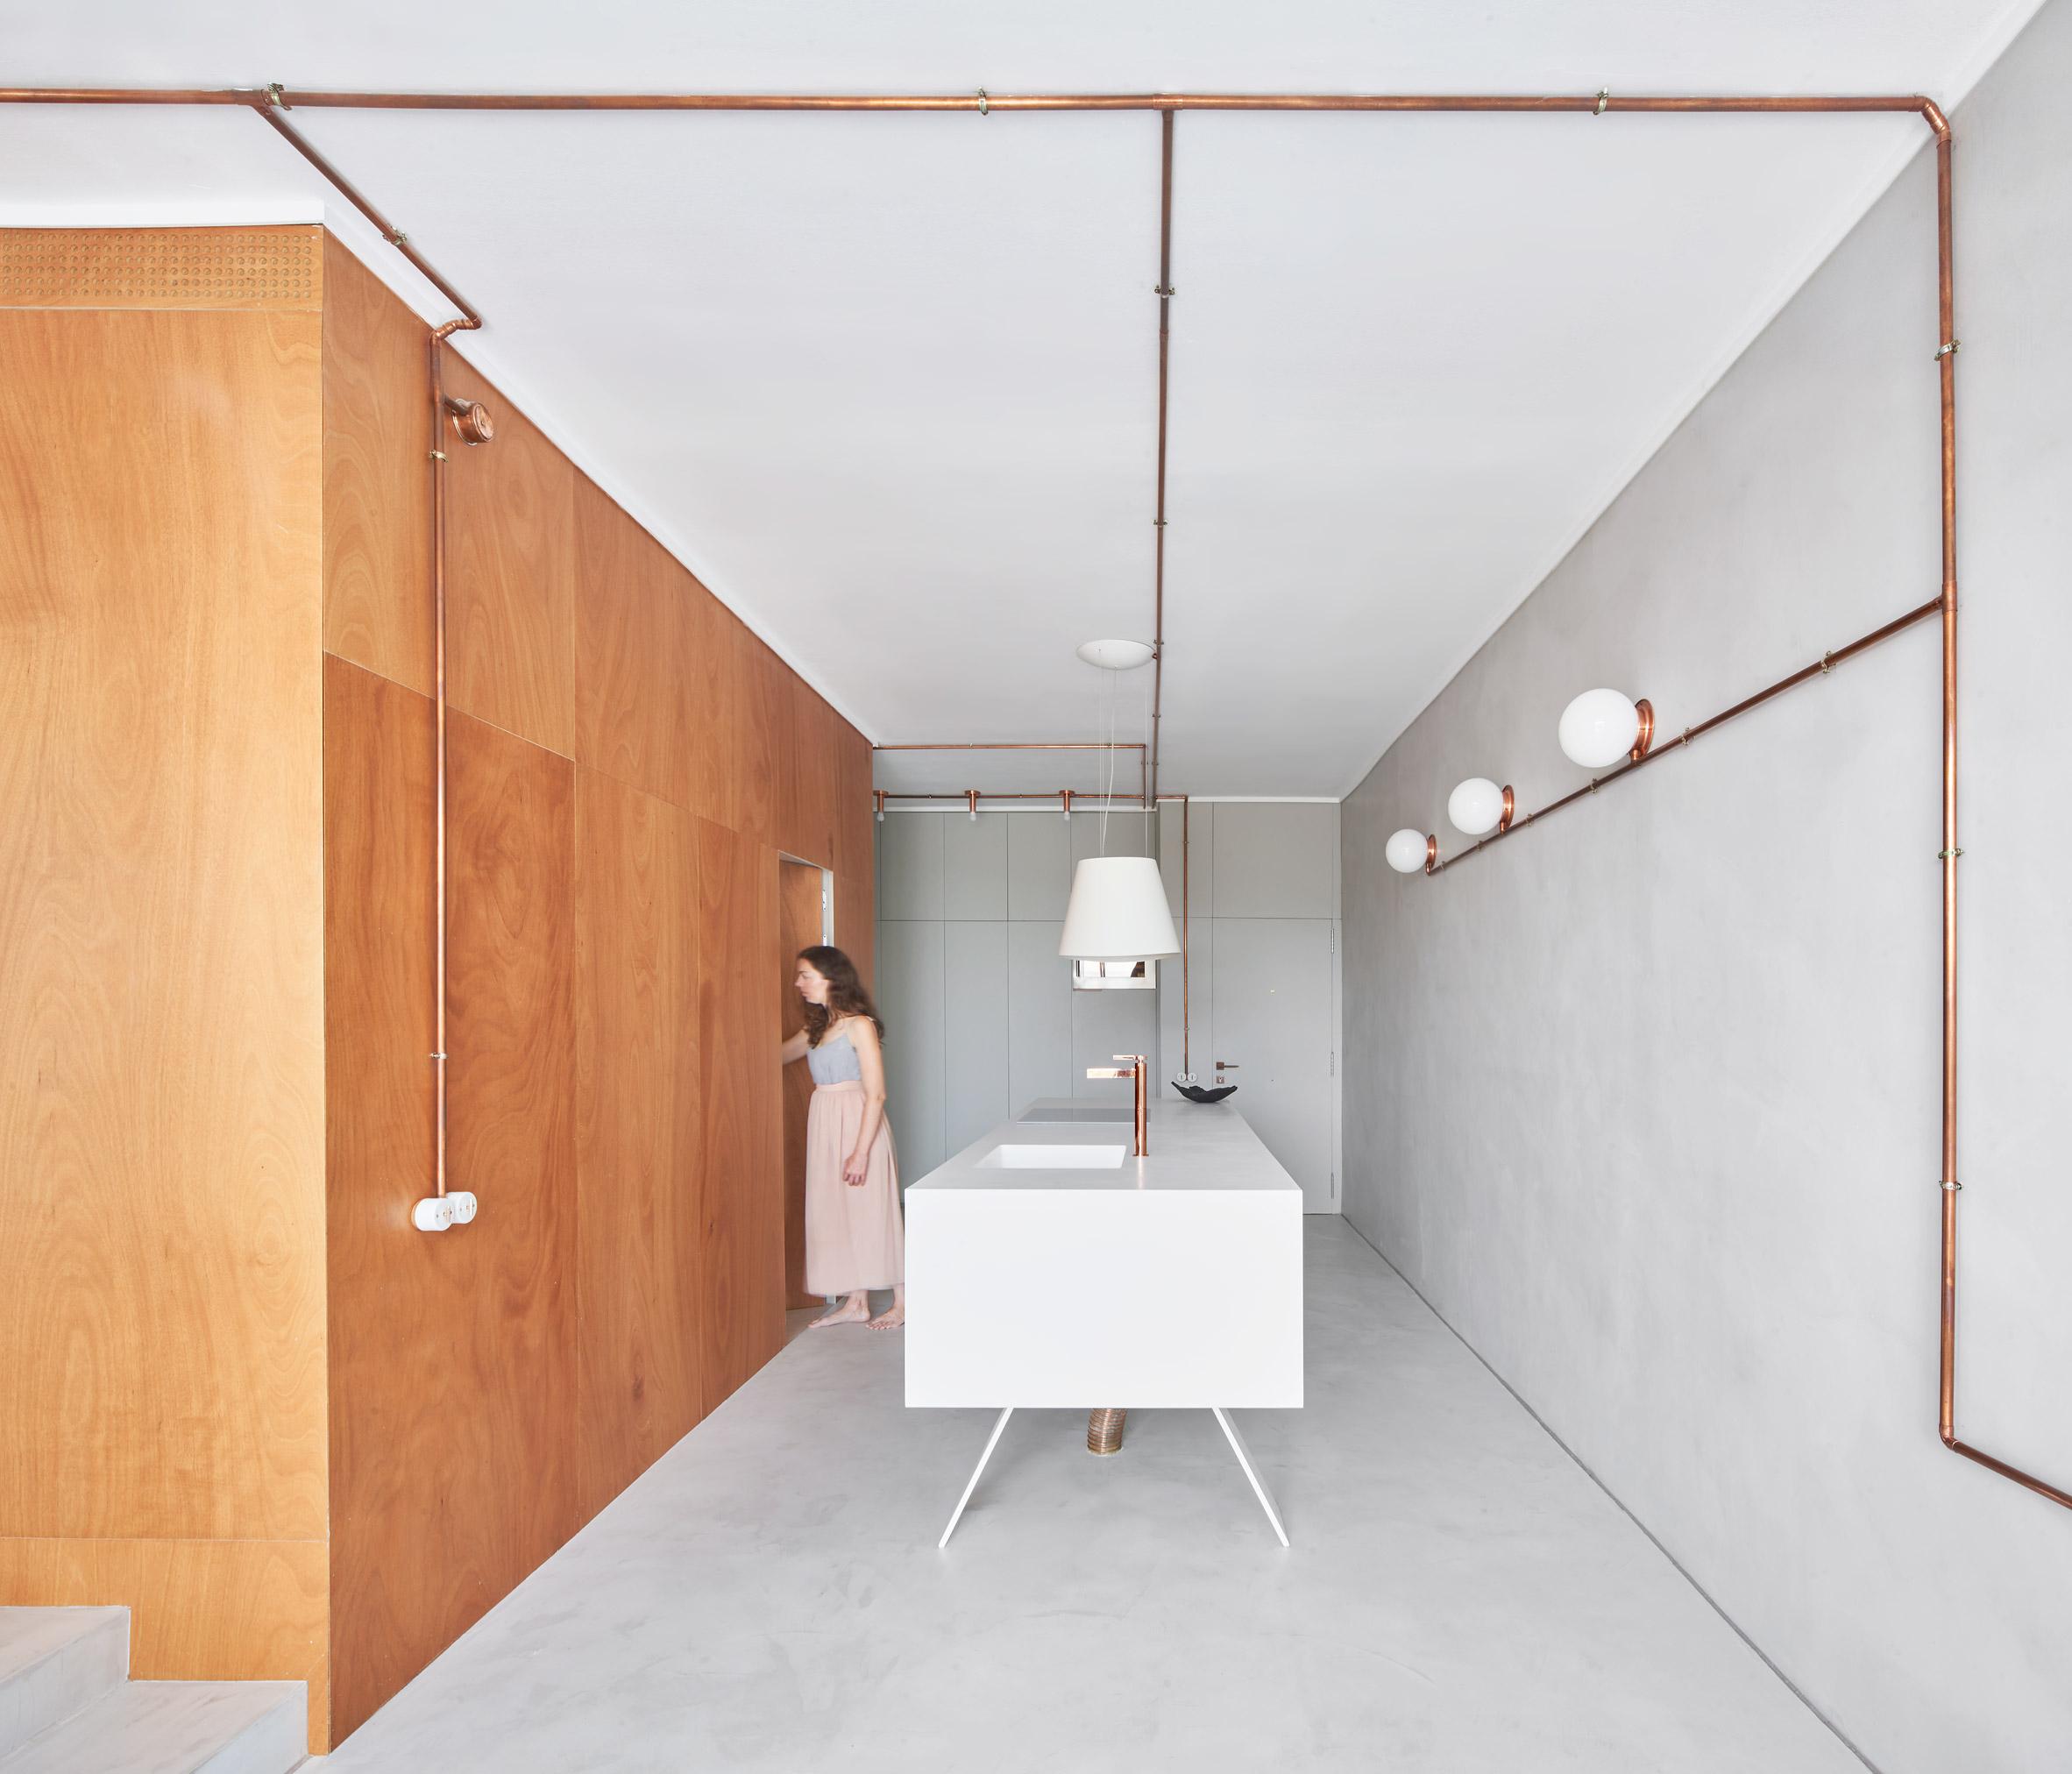 Interiors of Barcelona marina apartment, designed by Cometa Architects